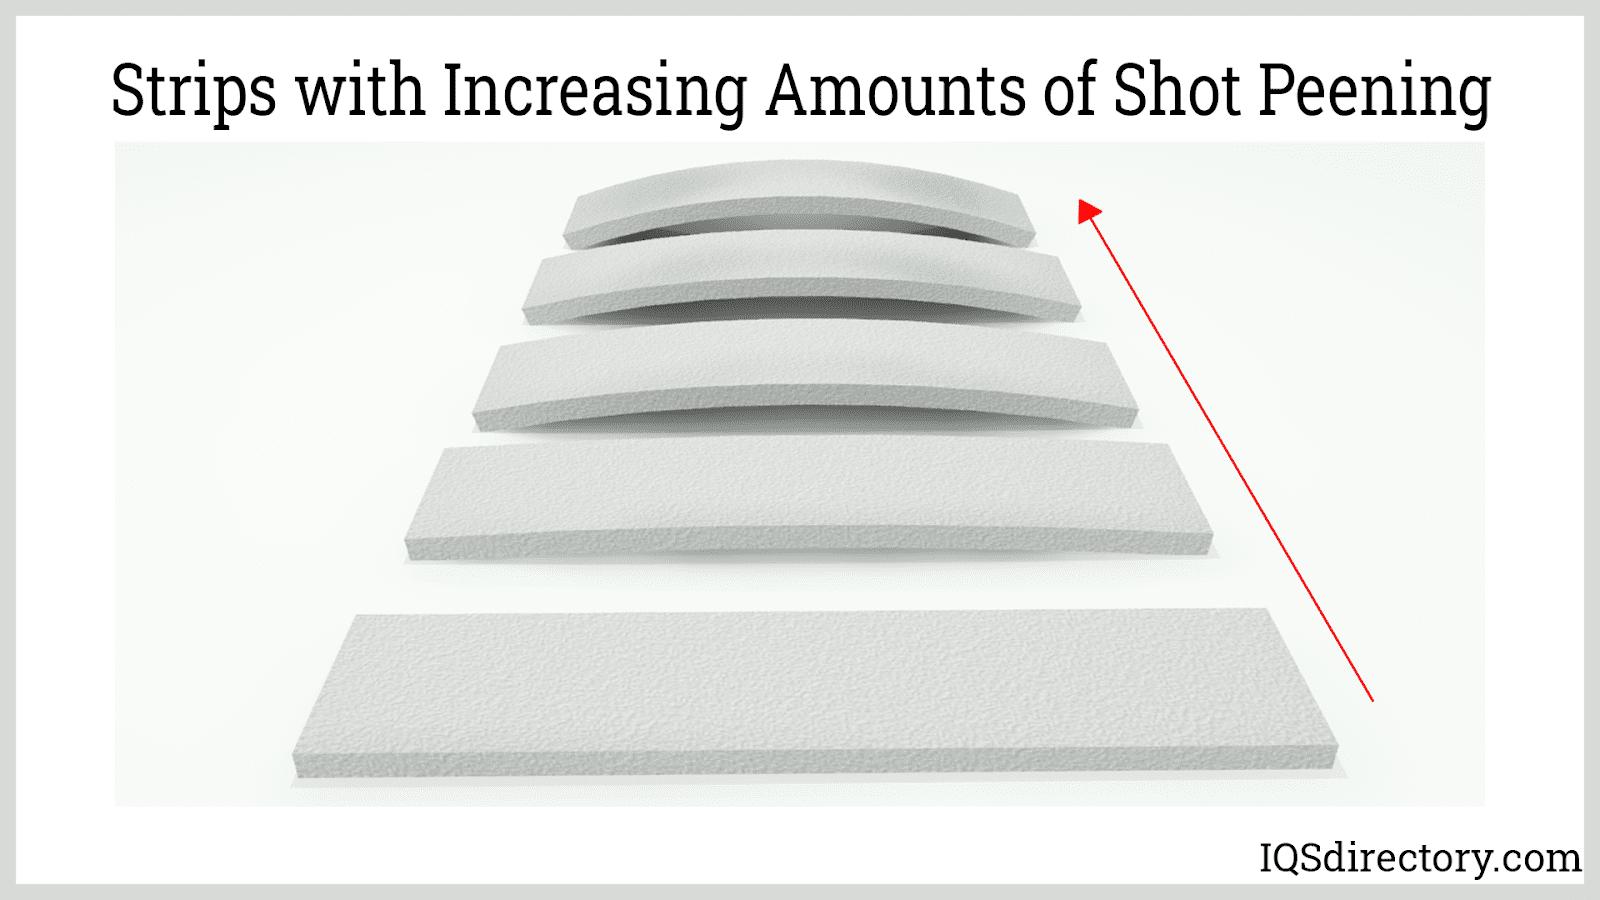 Strips with Increasing Amounts of Shot Peening